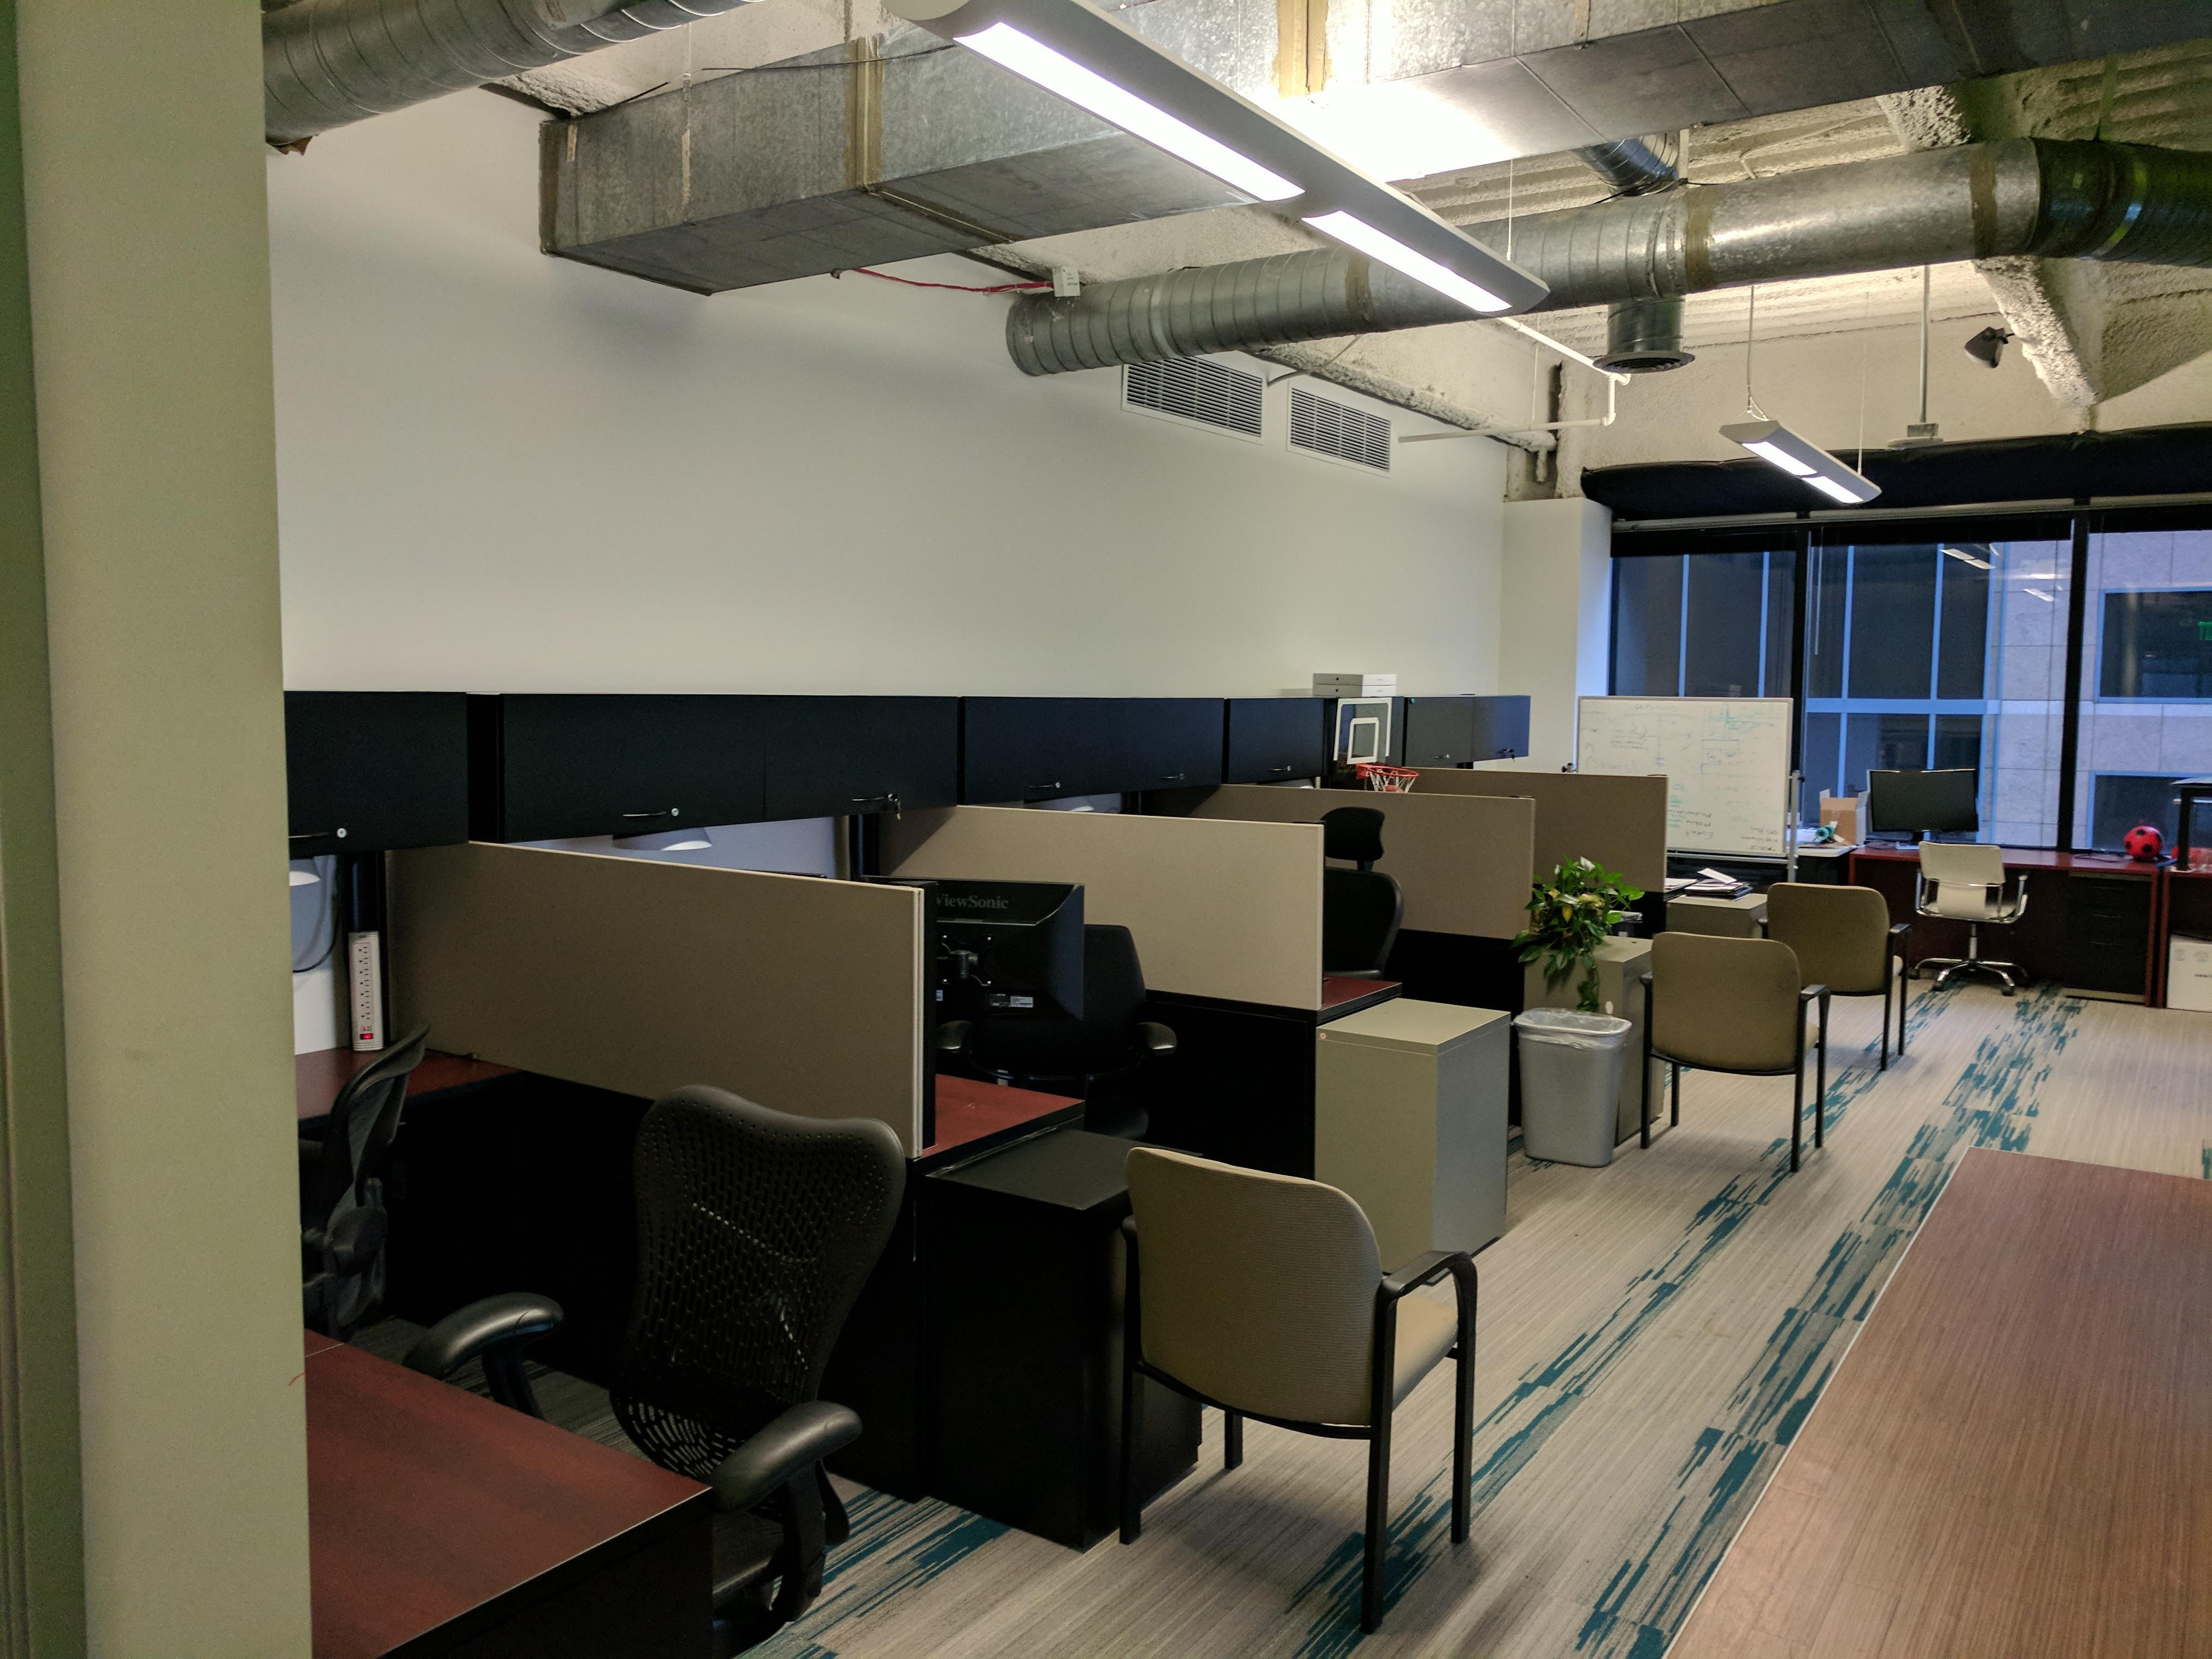 Downtown Digital Marketing Agency - Office Suite 1